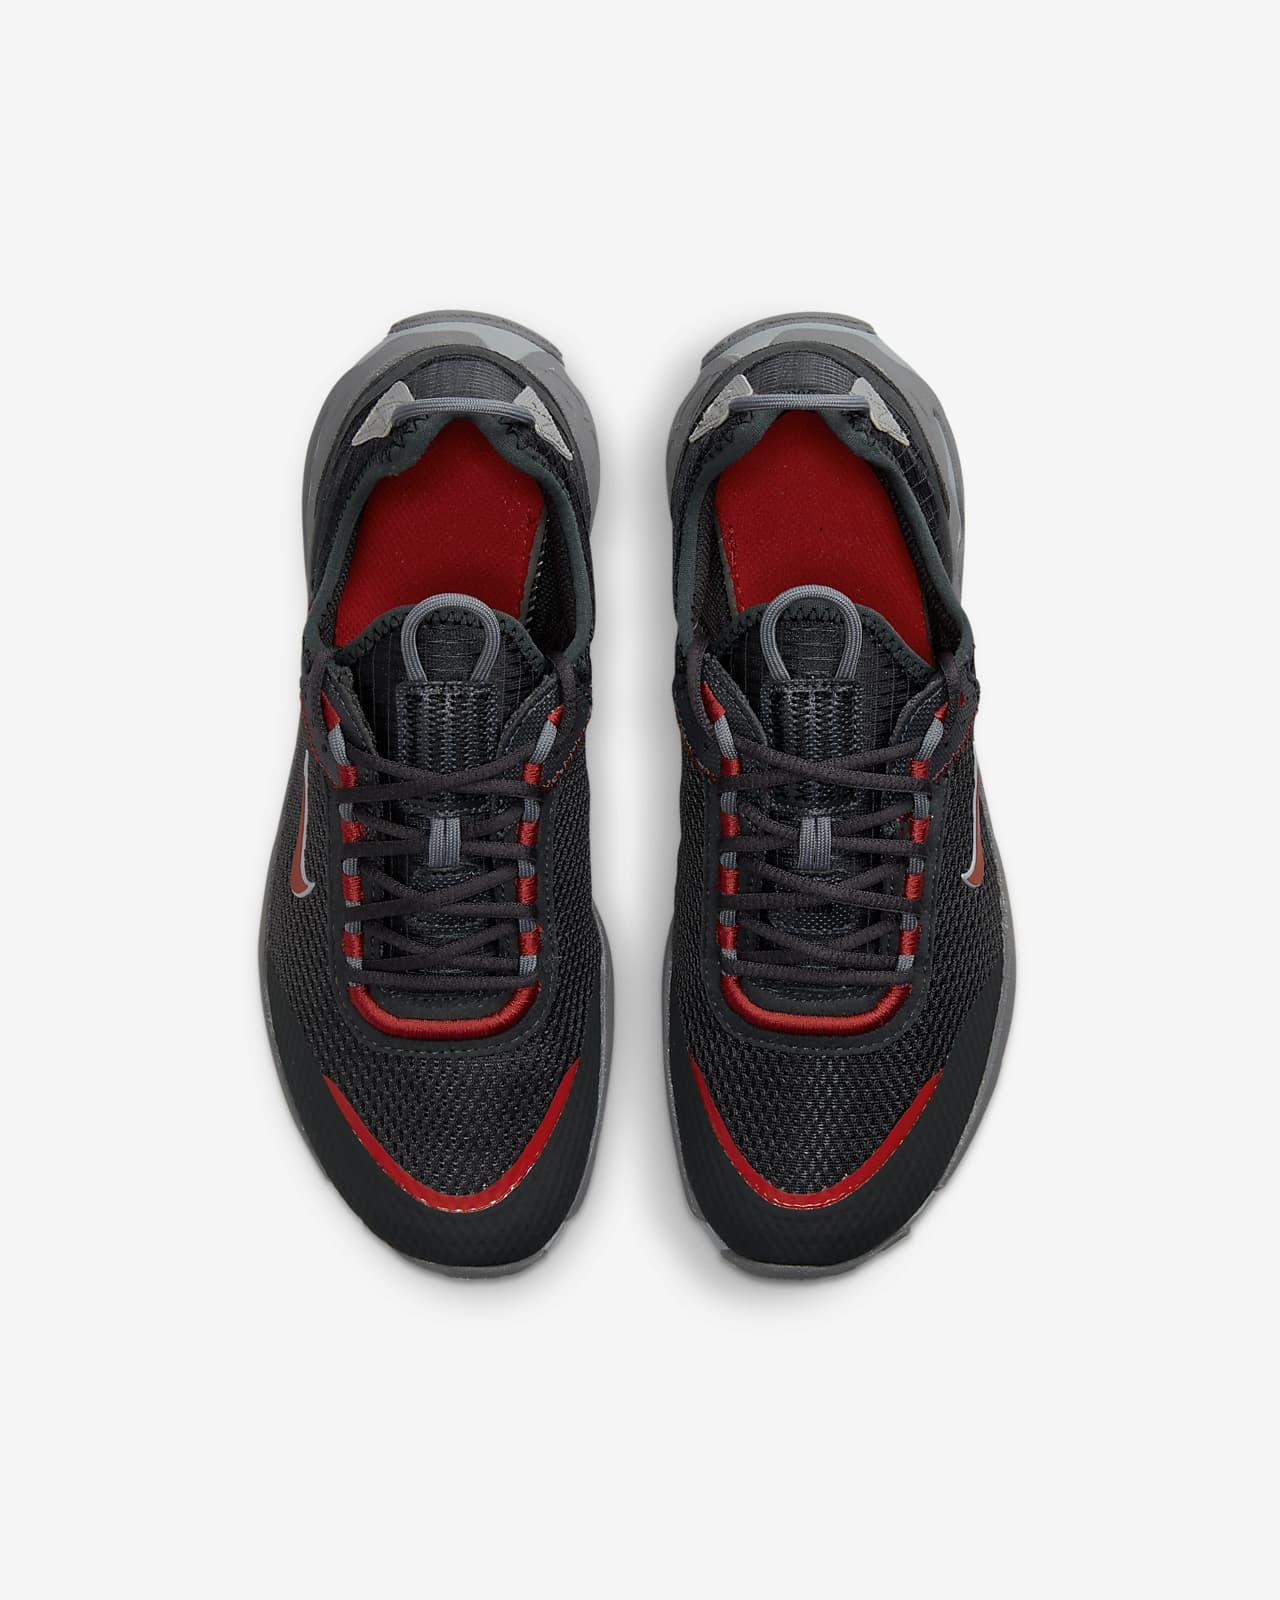 Nike React Live Older Kids' Shoe. Nike LU